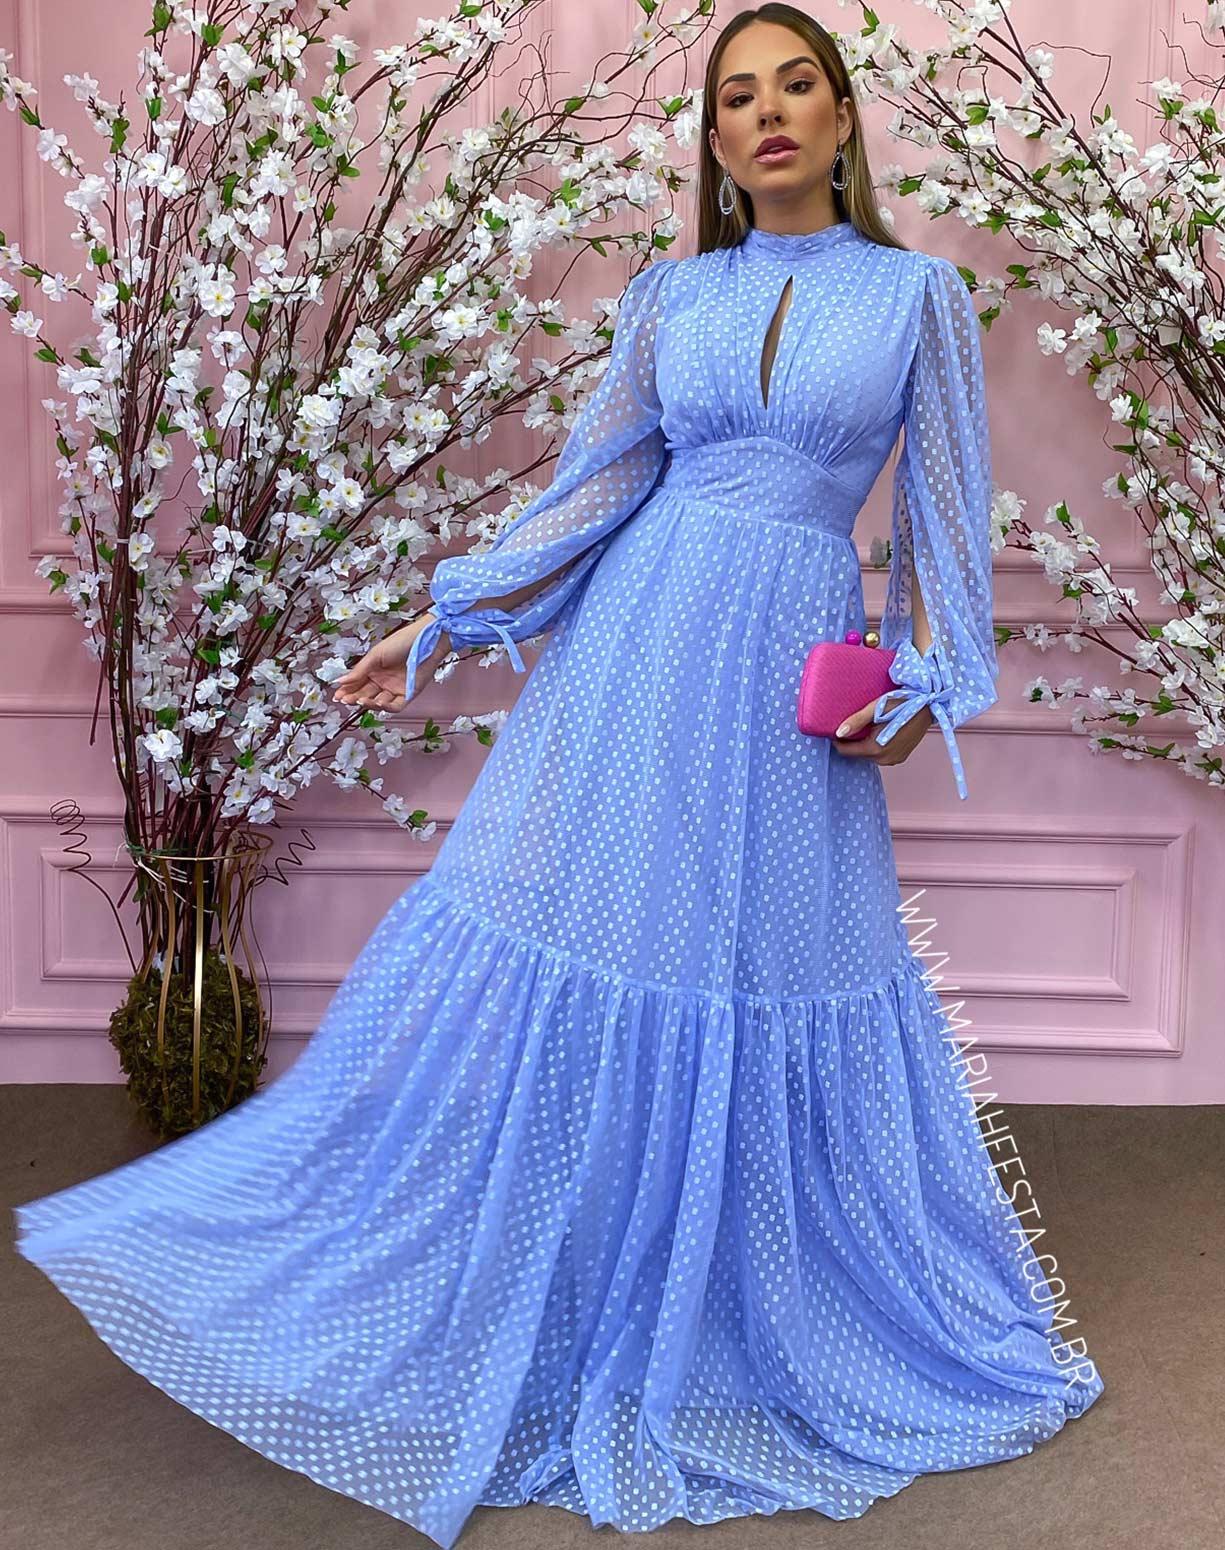 Vestido Azul Serenity Manga Longa em Tule Texturizado